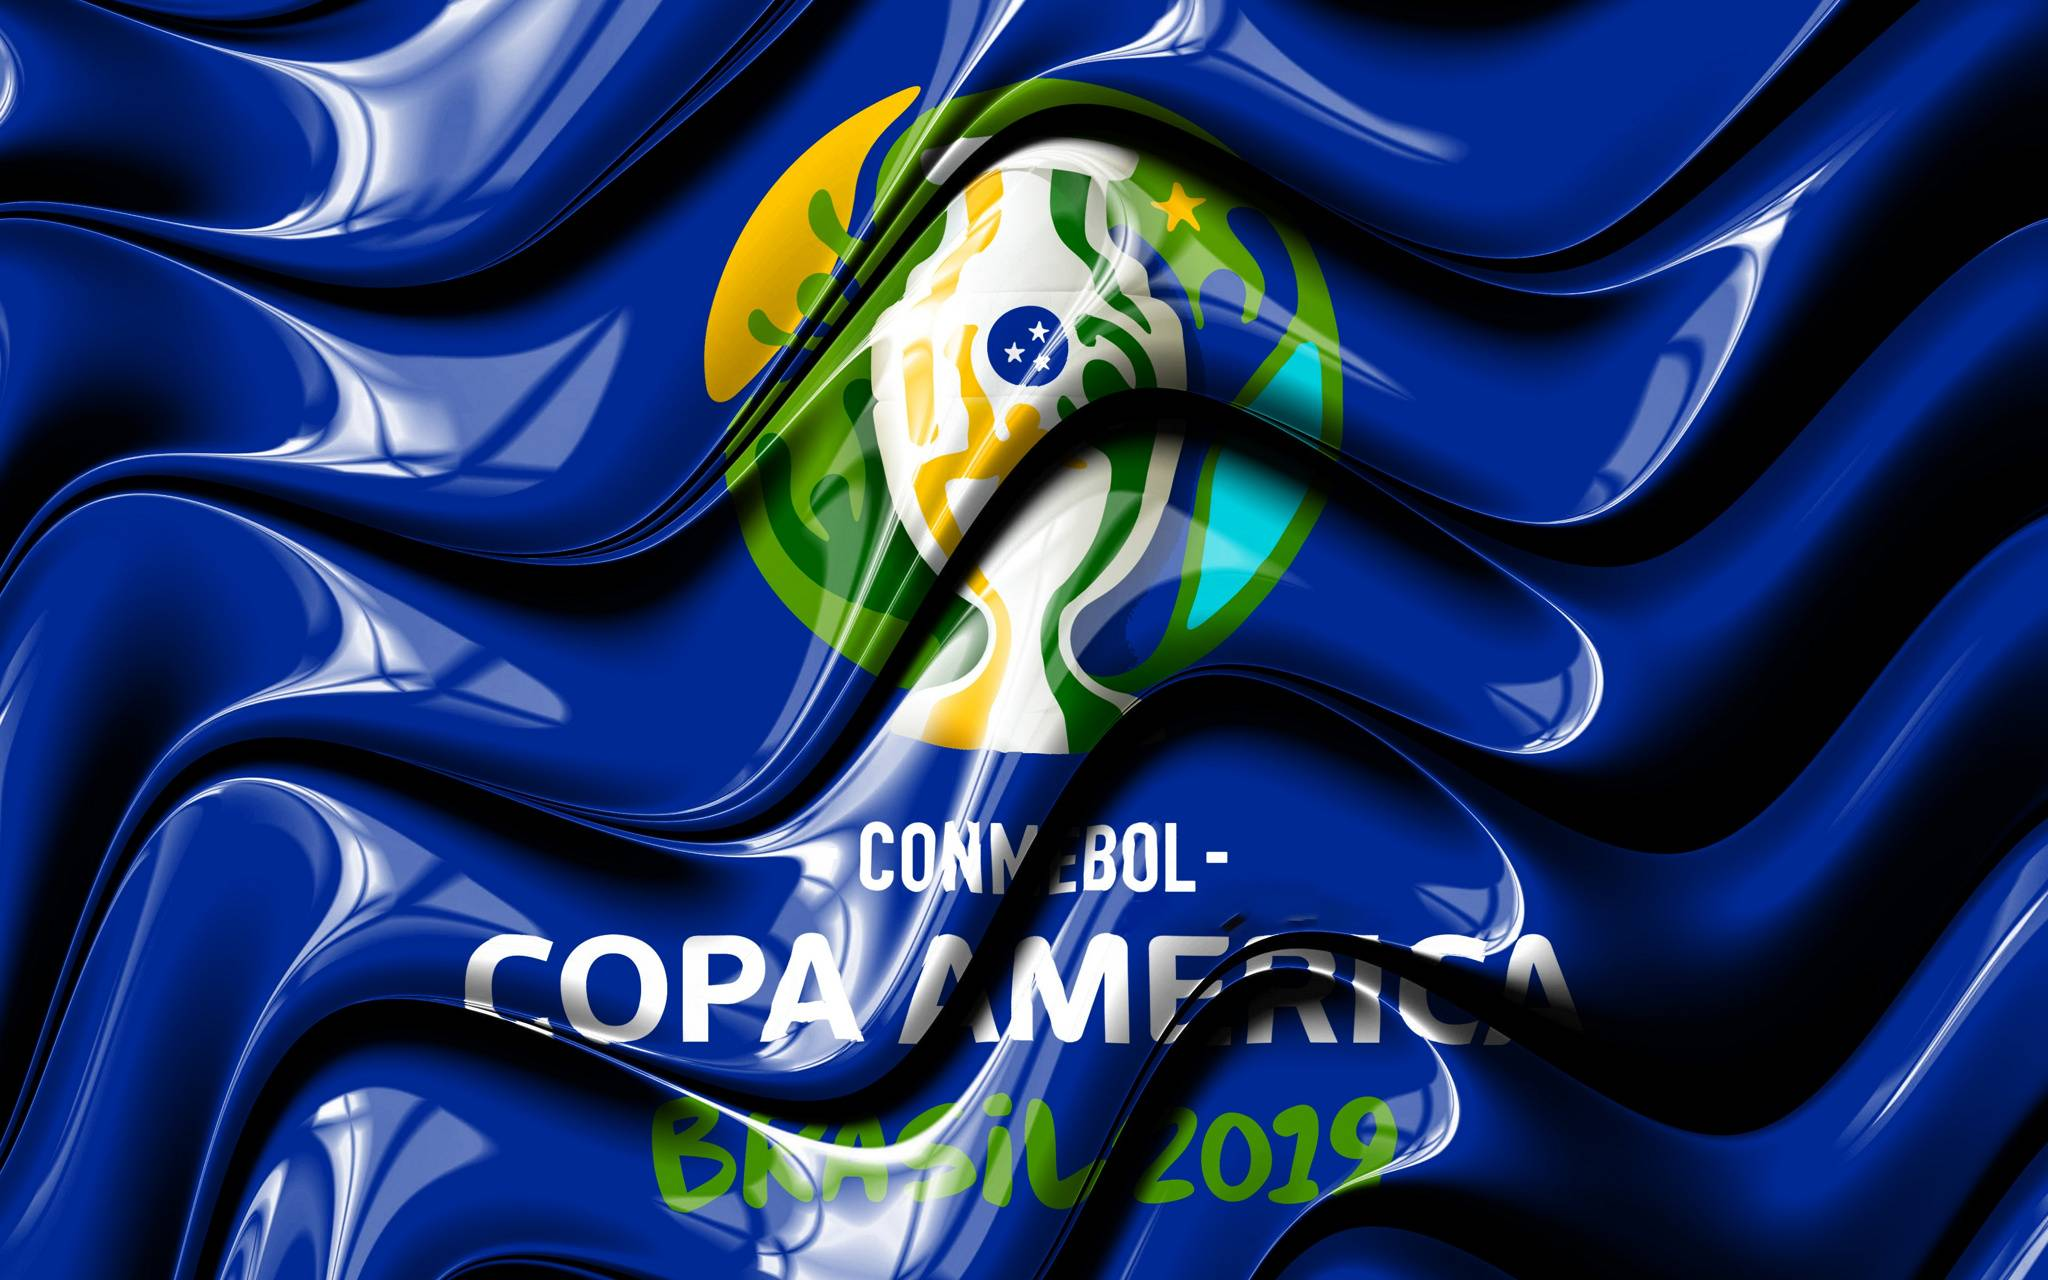 Comebol Brazil